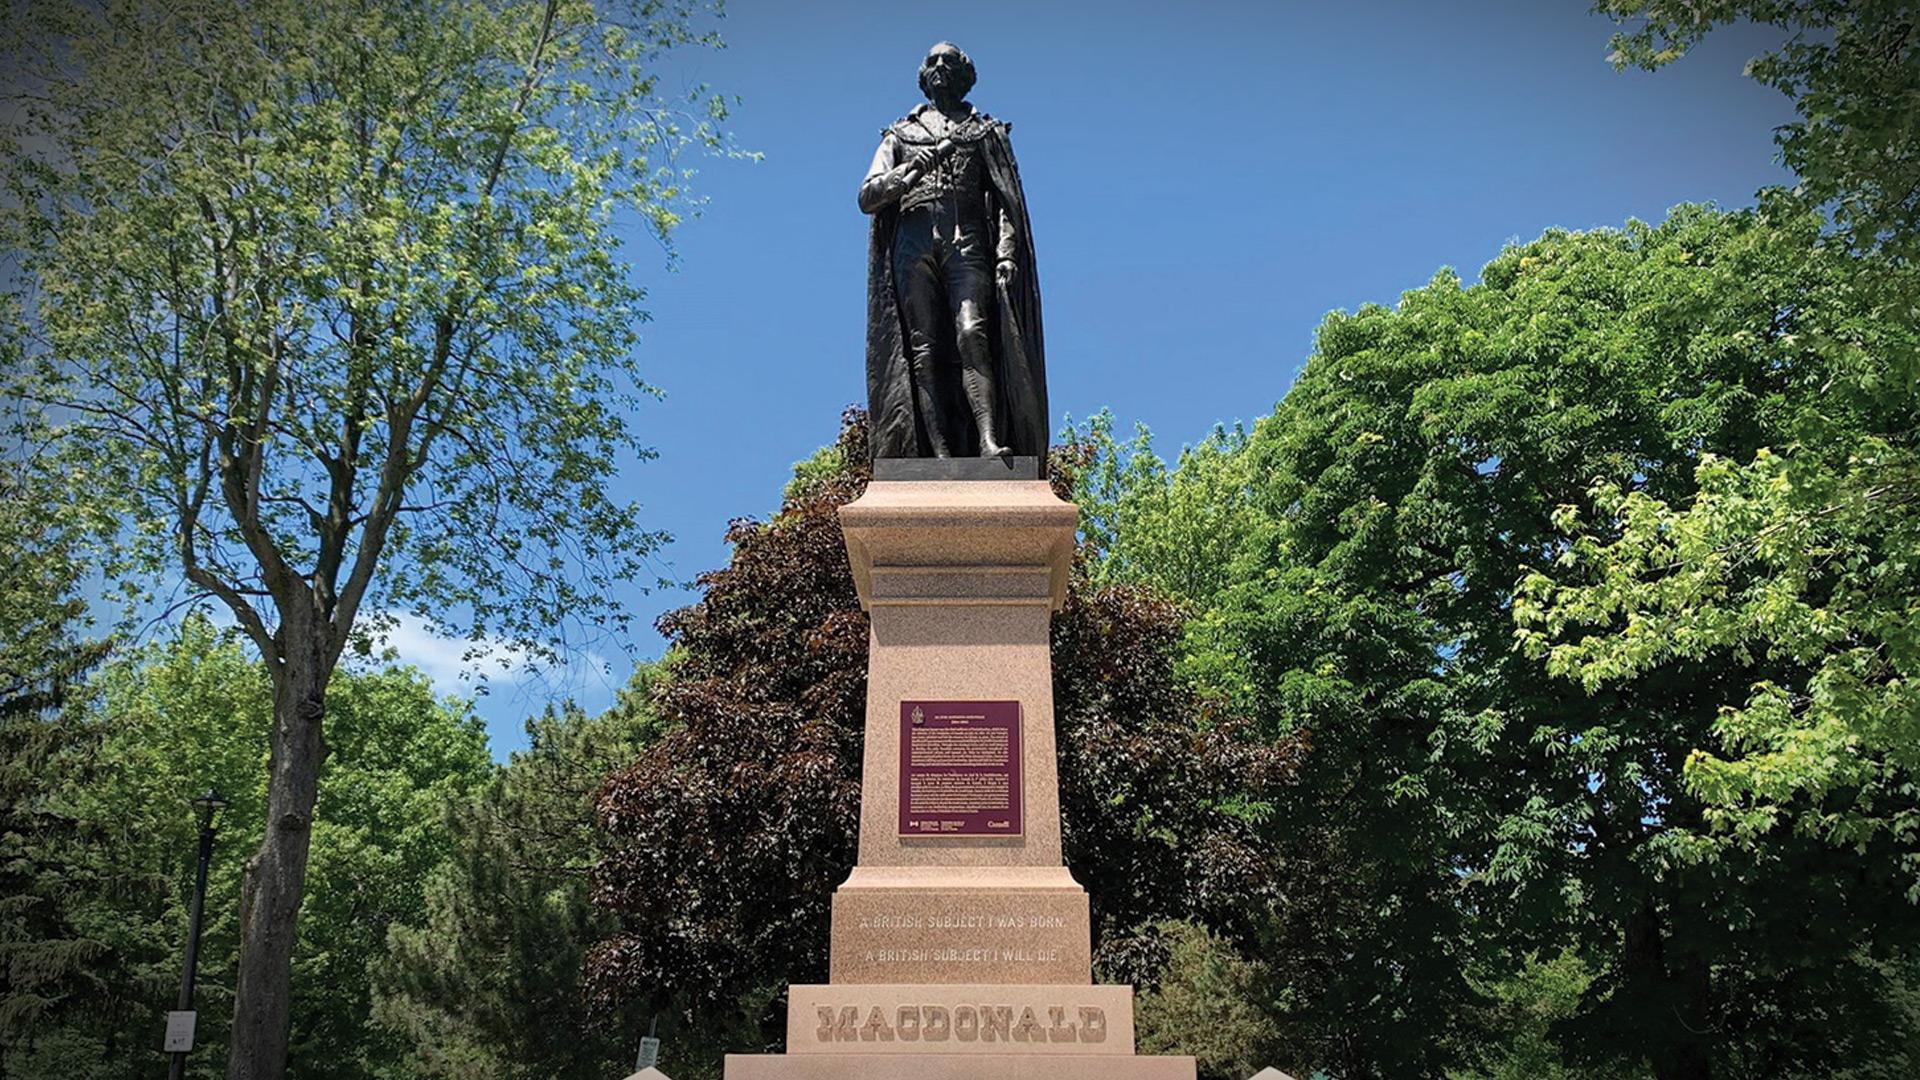 Sir John A. Macdonald gravesite vandalized on Canada Day